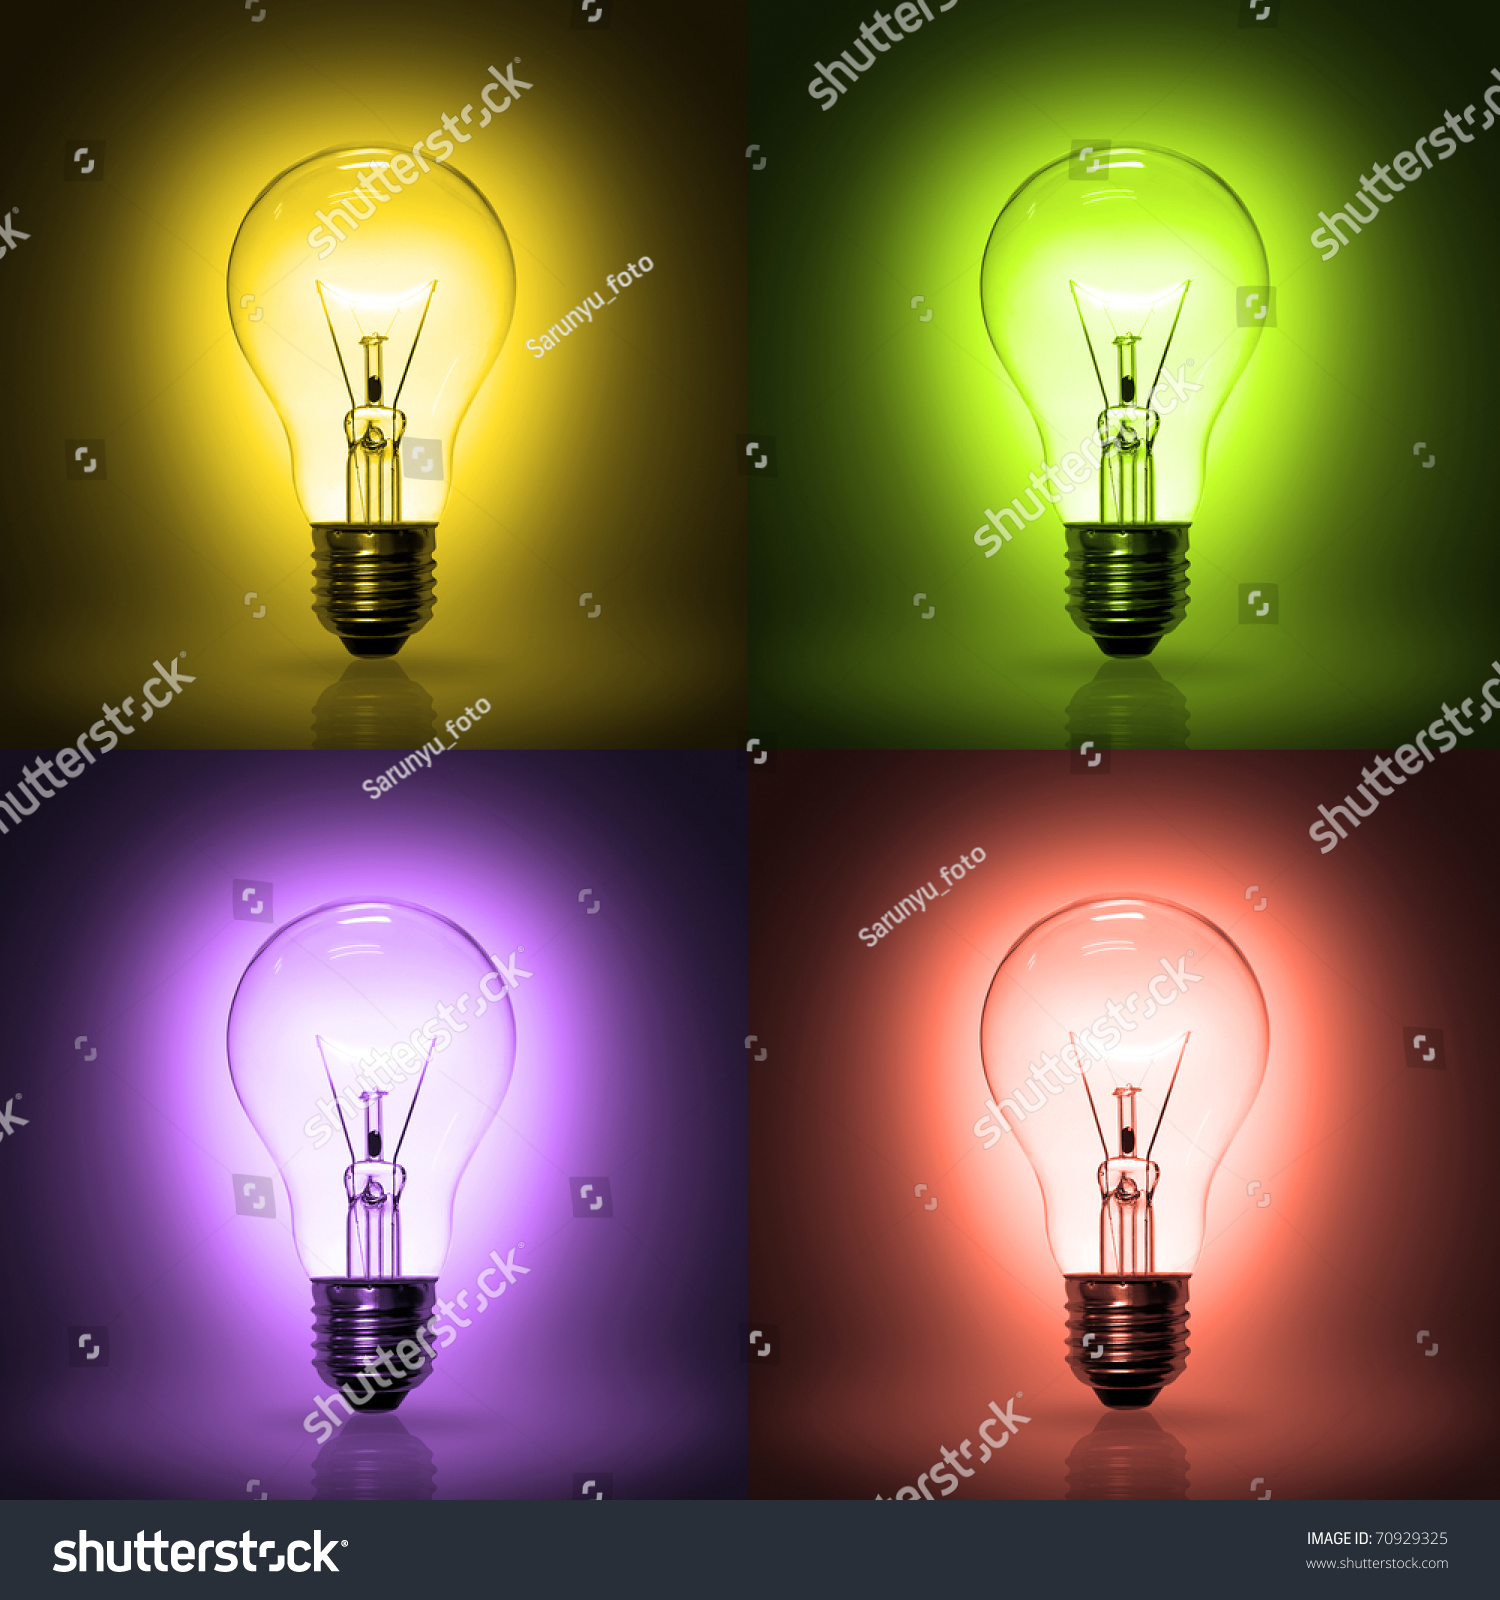 Light Bulb Wallpaper: Light Bulb On Colorful Background Stock Photo 70929325